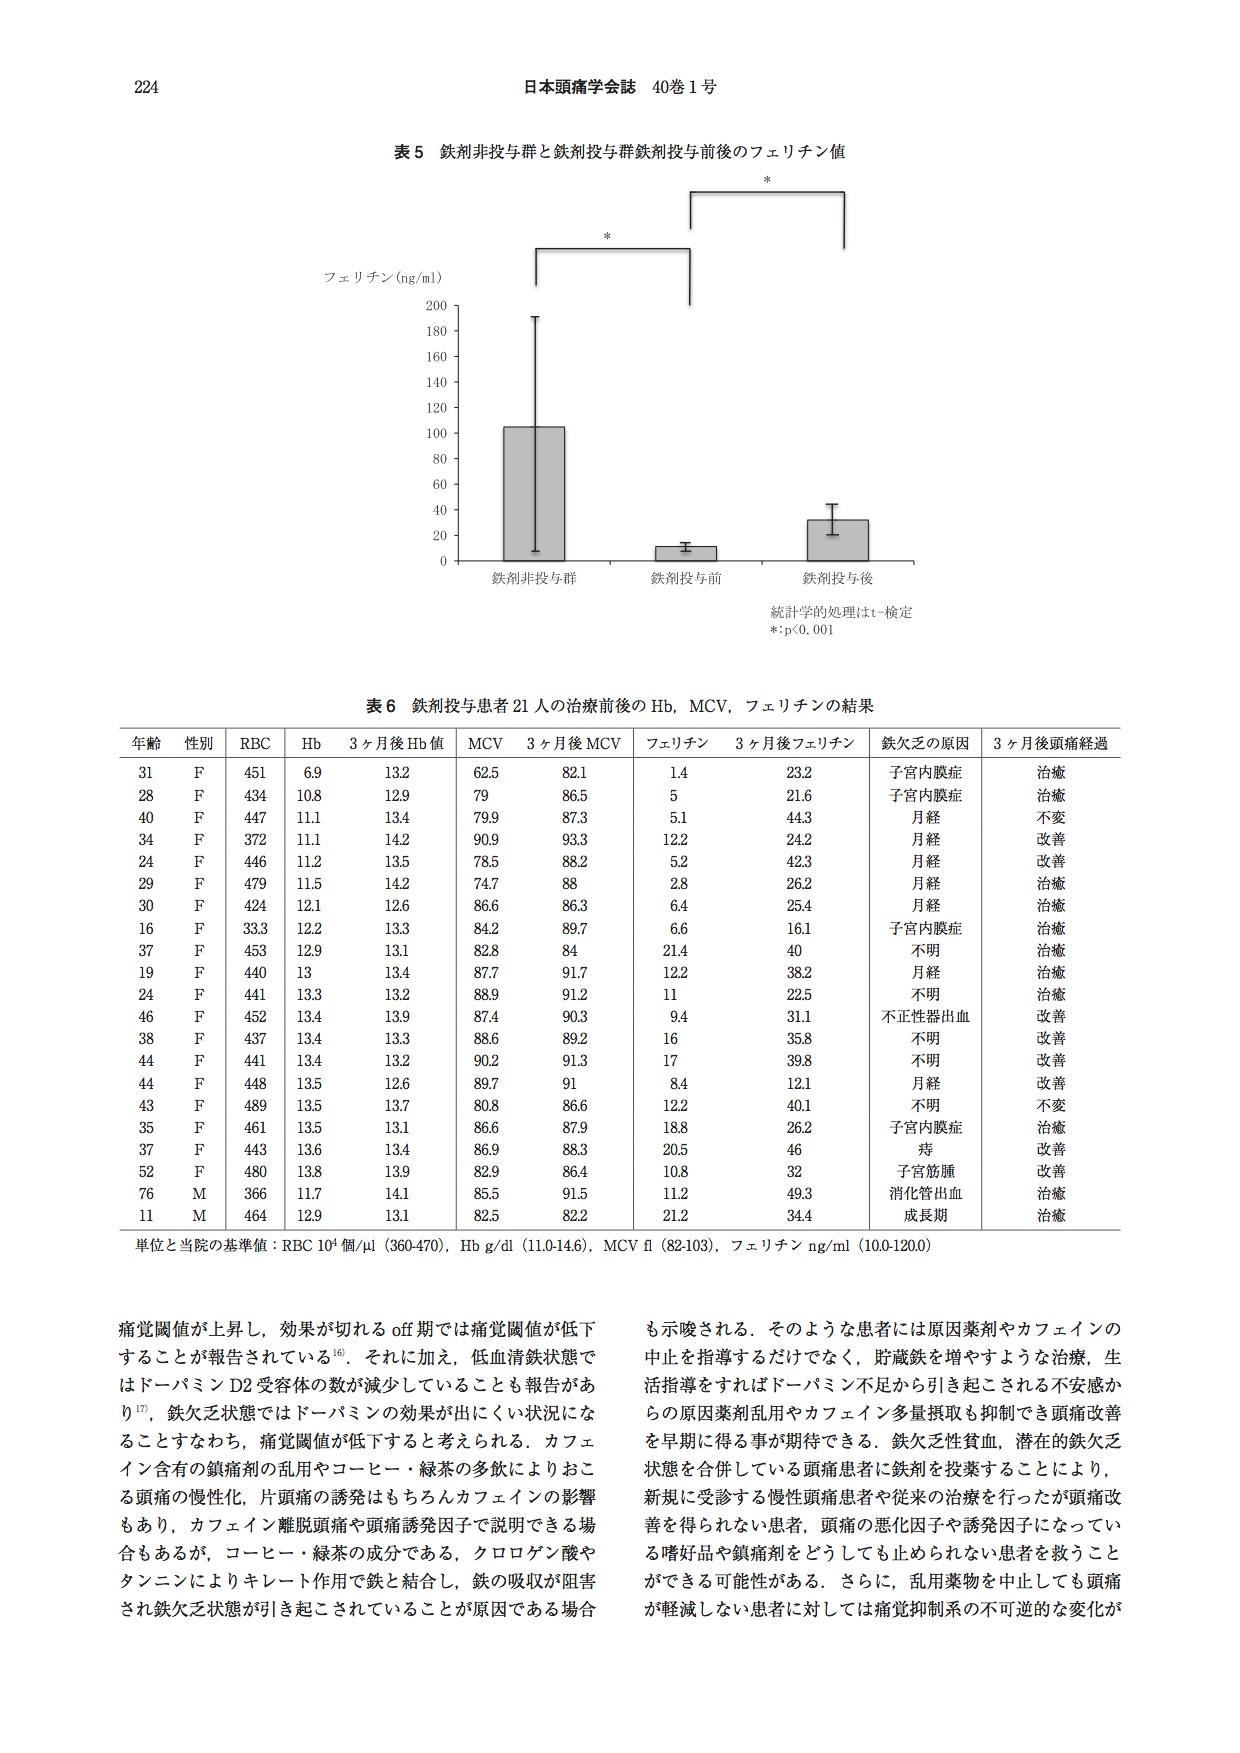 2013_40_no1.鉄剤投与pdf-4.jpg